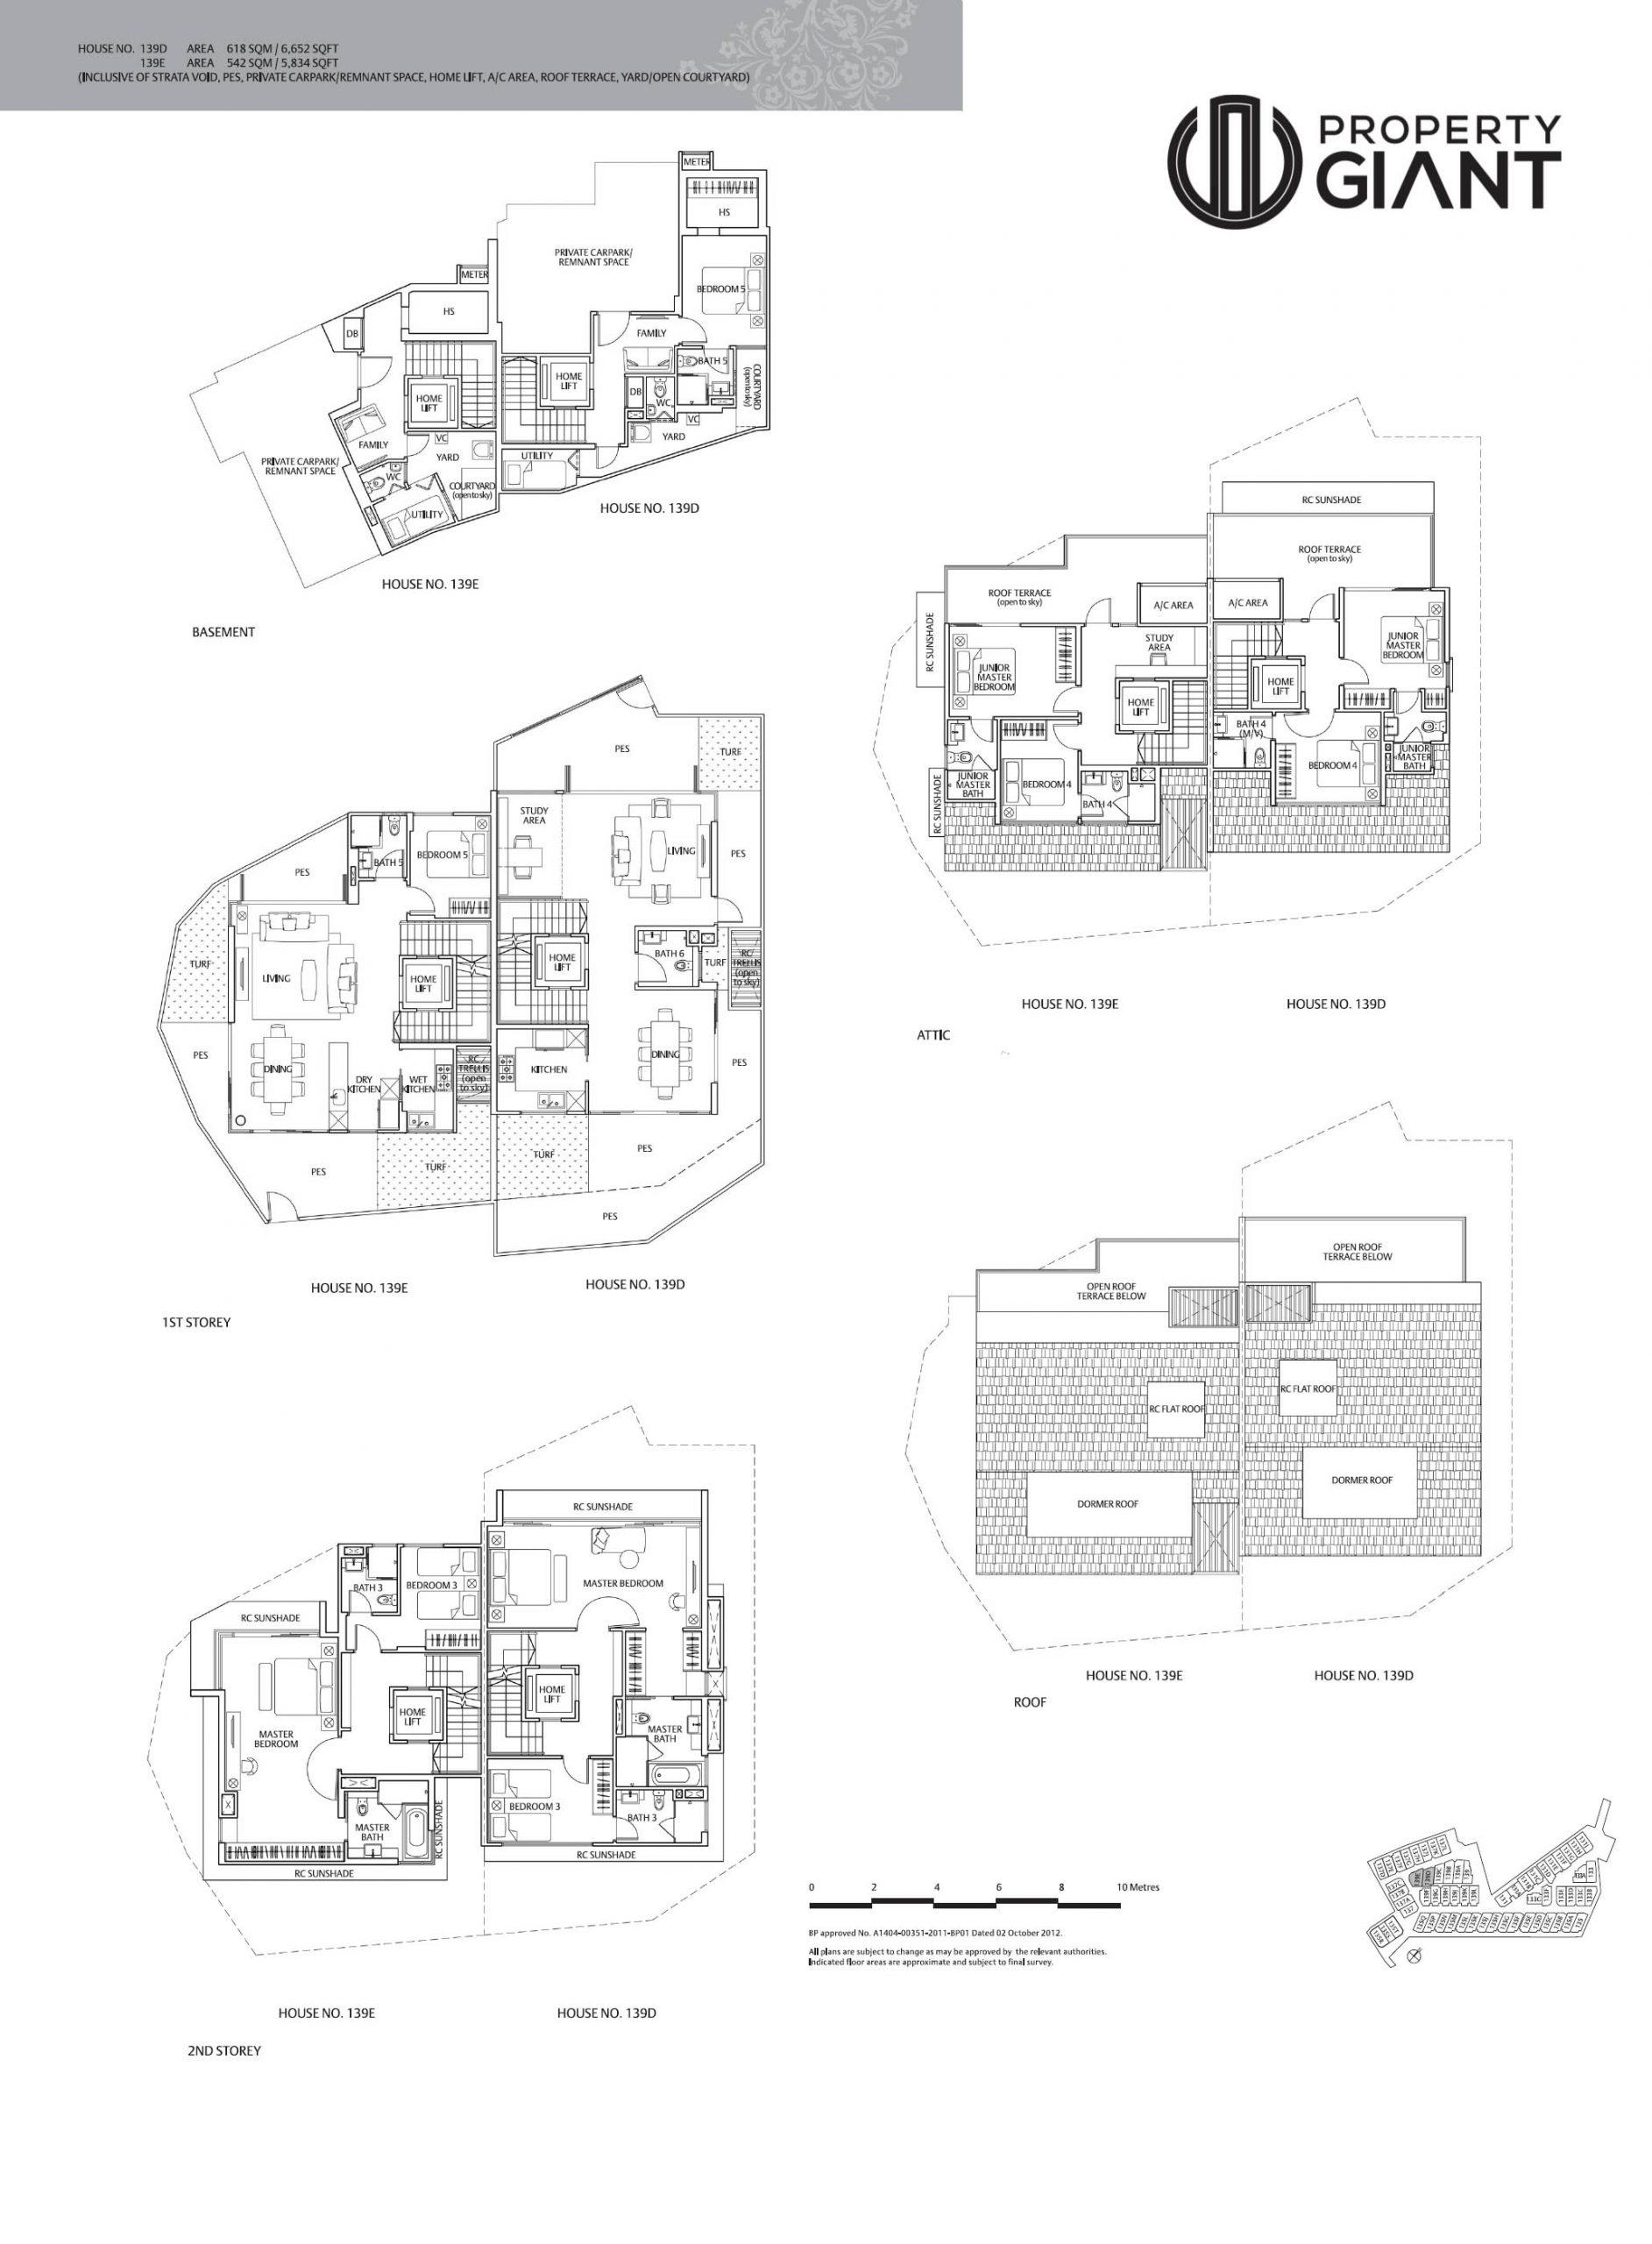 House No. 139D